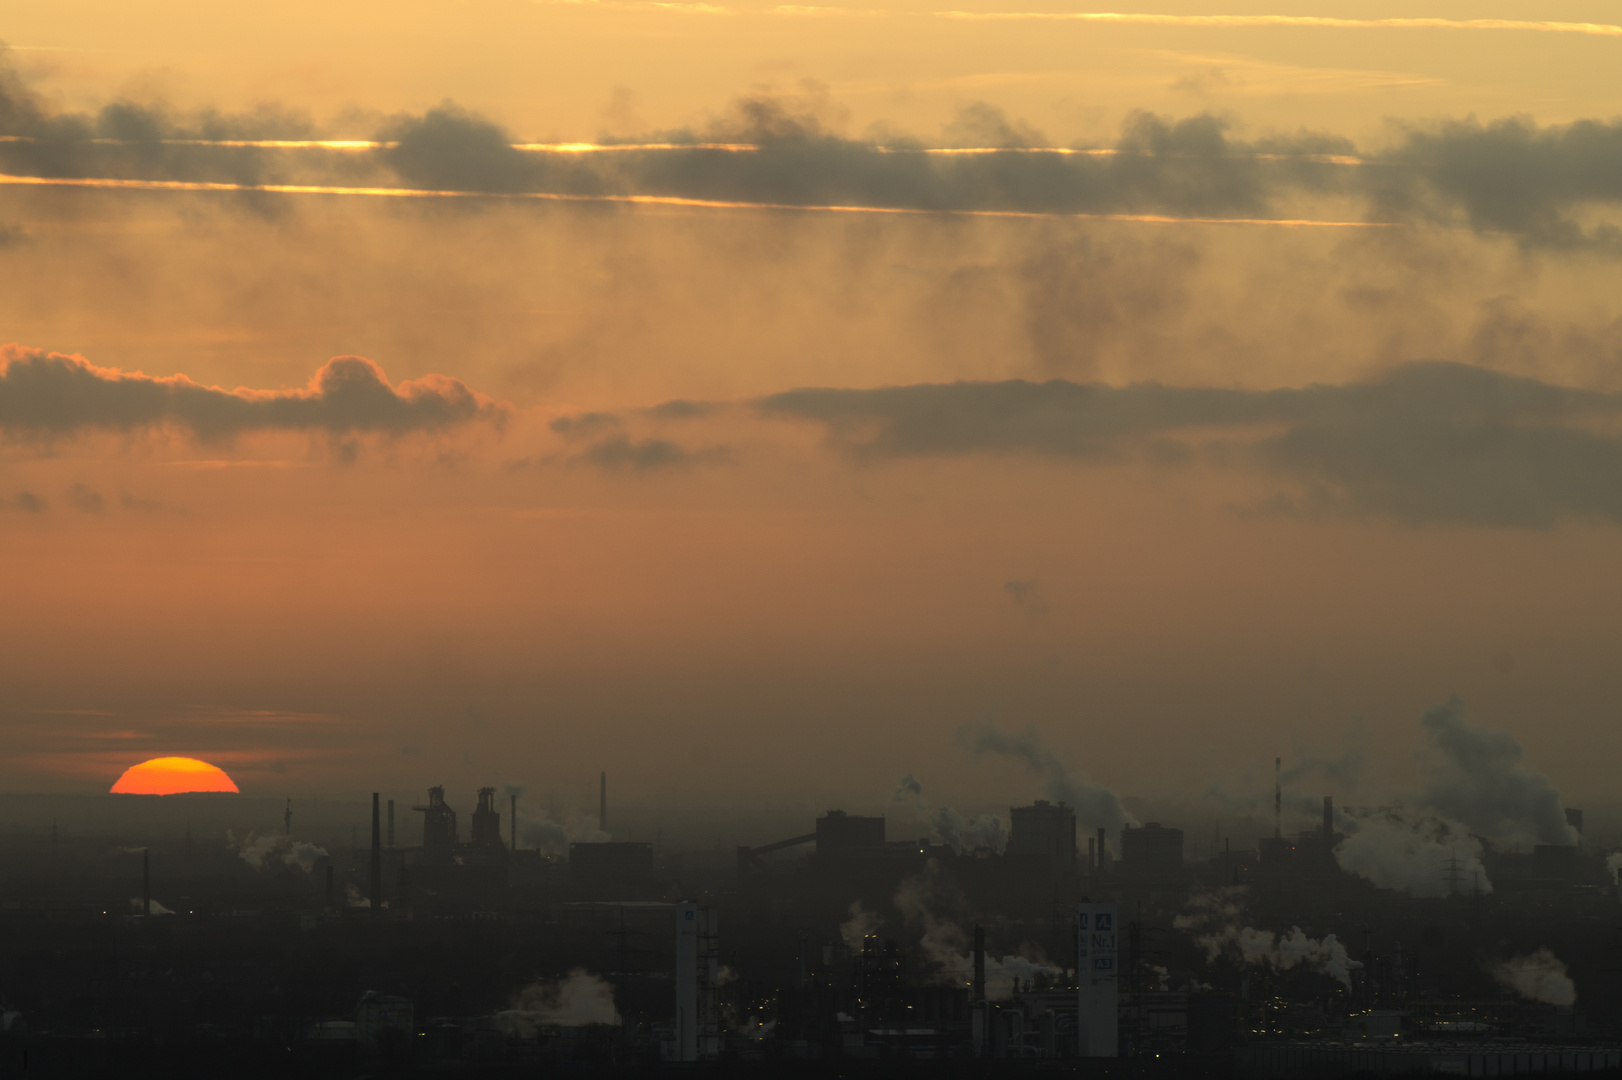 Sonnenuntergang in Duisburg